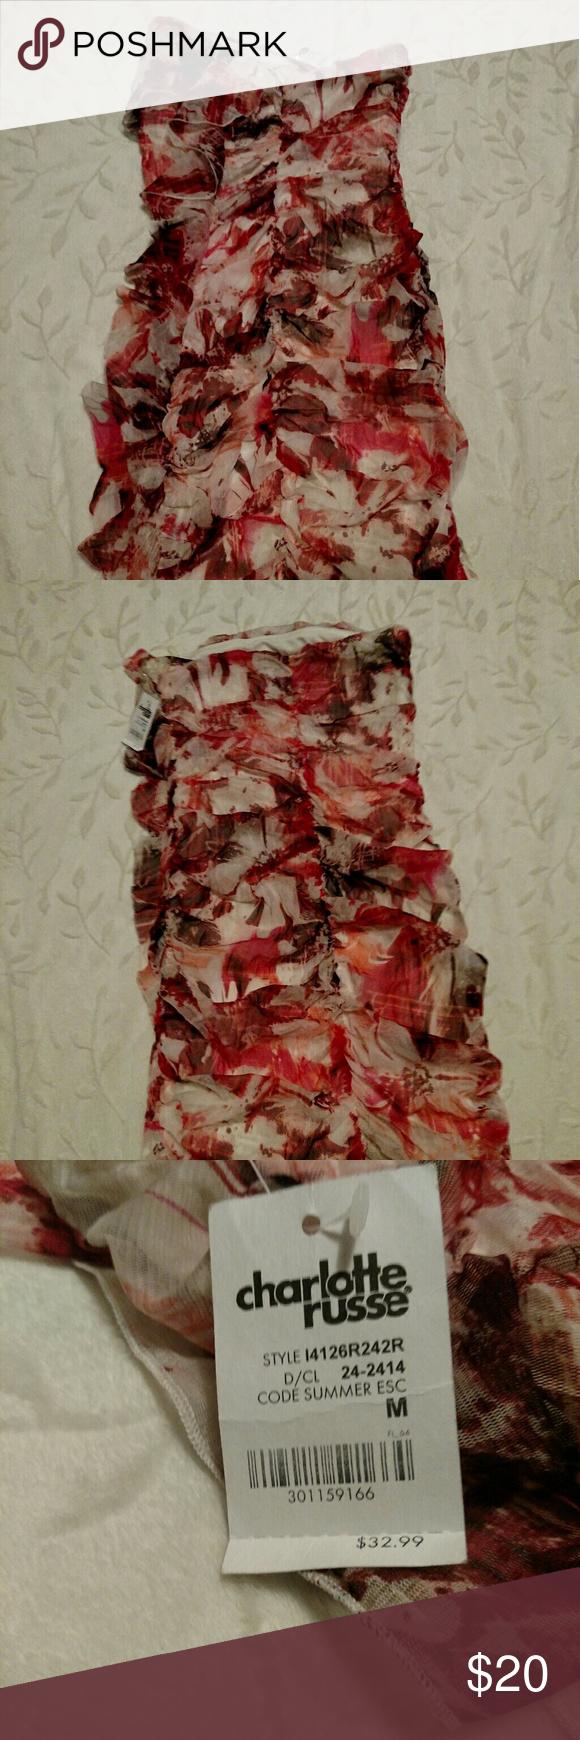 CHARLOTTE RUSSE SUMMER DRESS Cute NWT Charlotte Russe dress. Size medium. Very tiny! Charlotte Russe Dresses